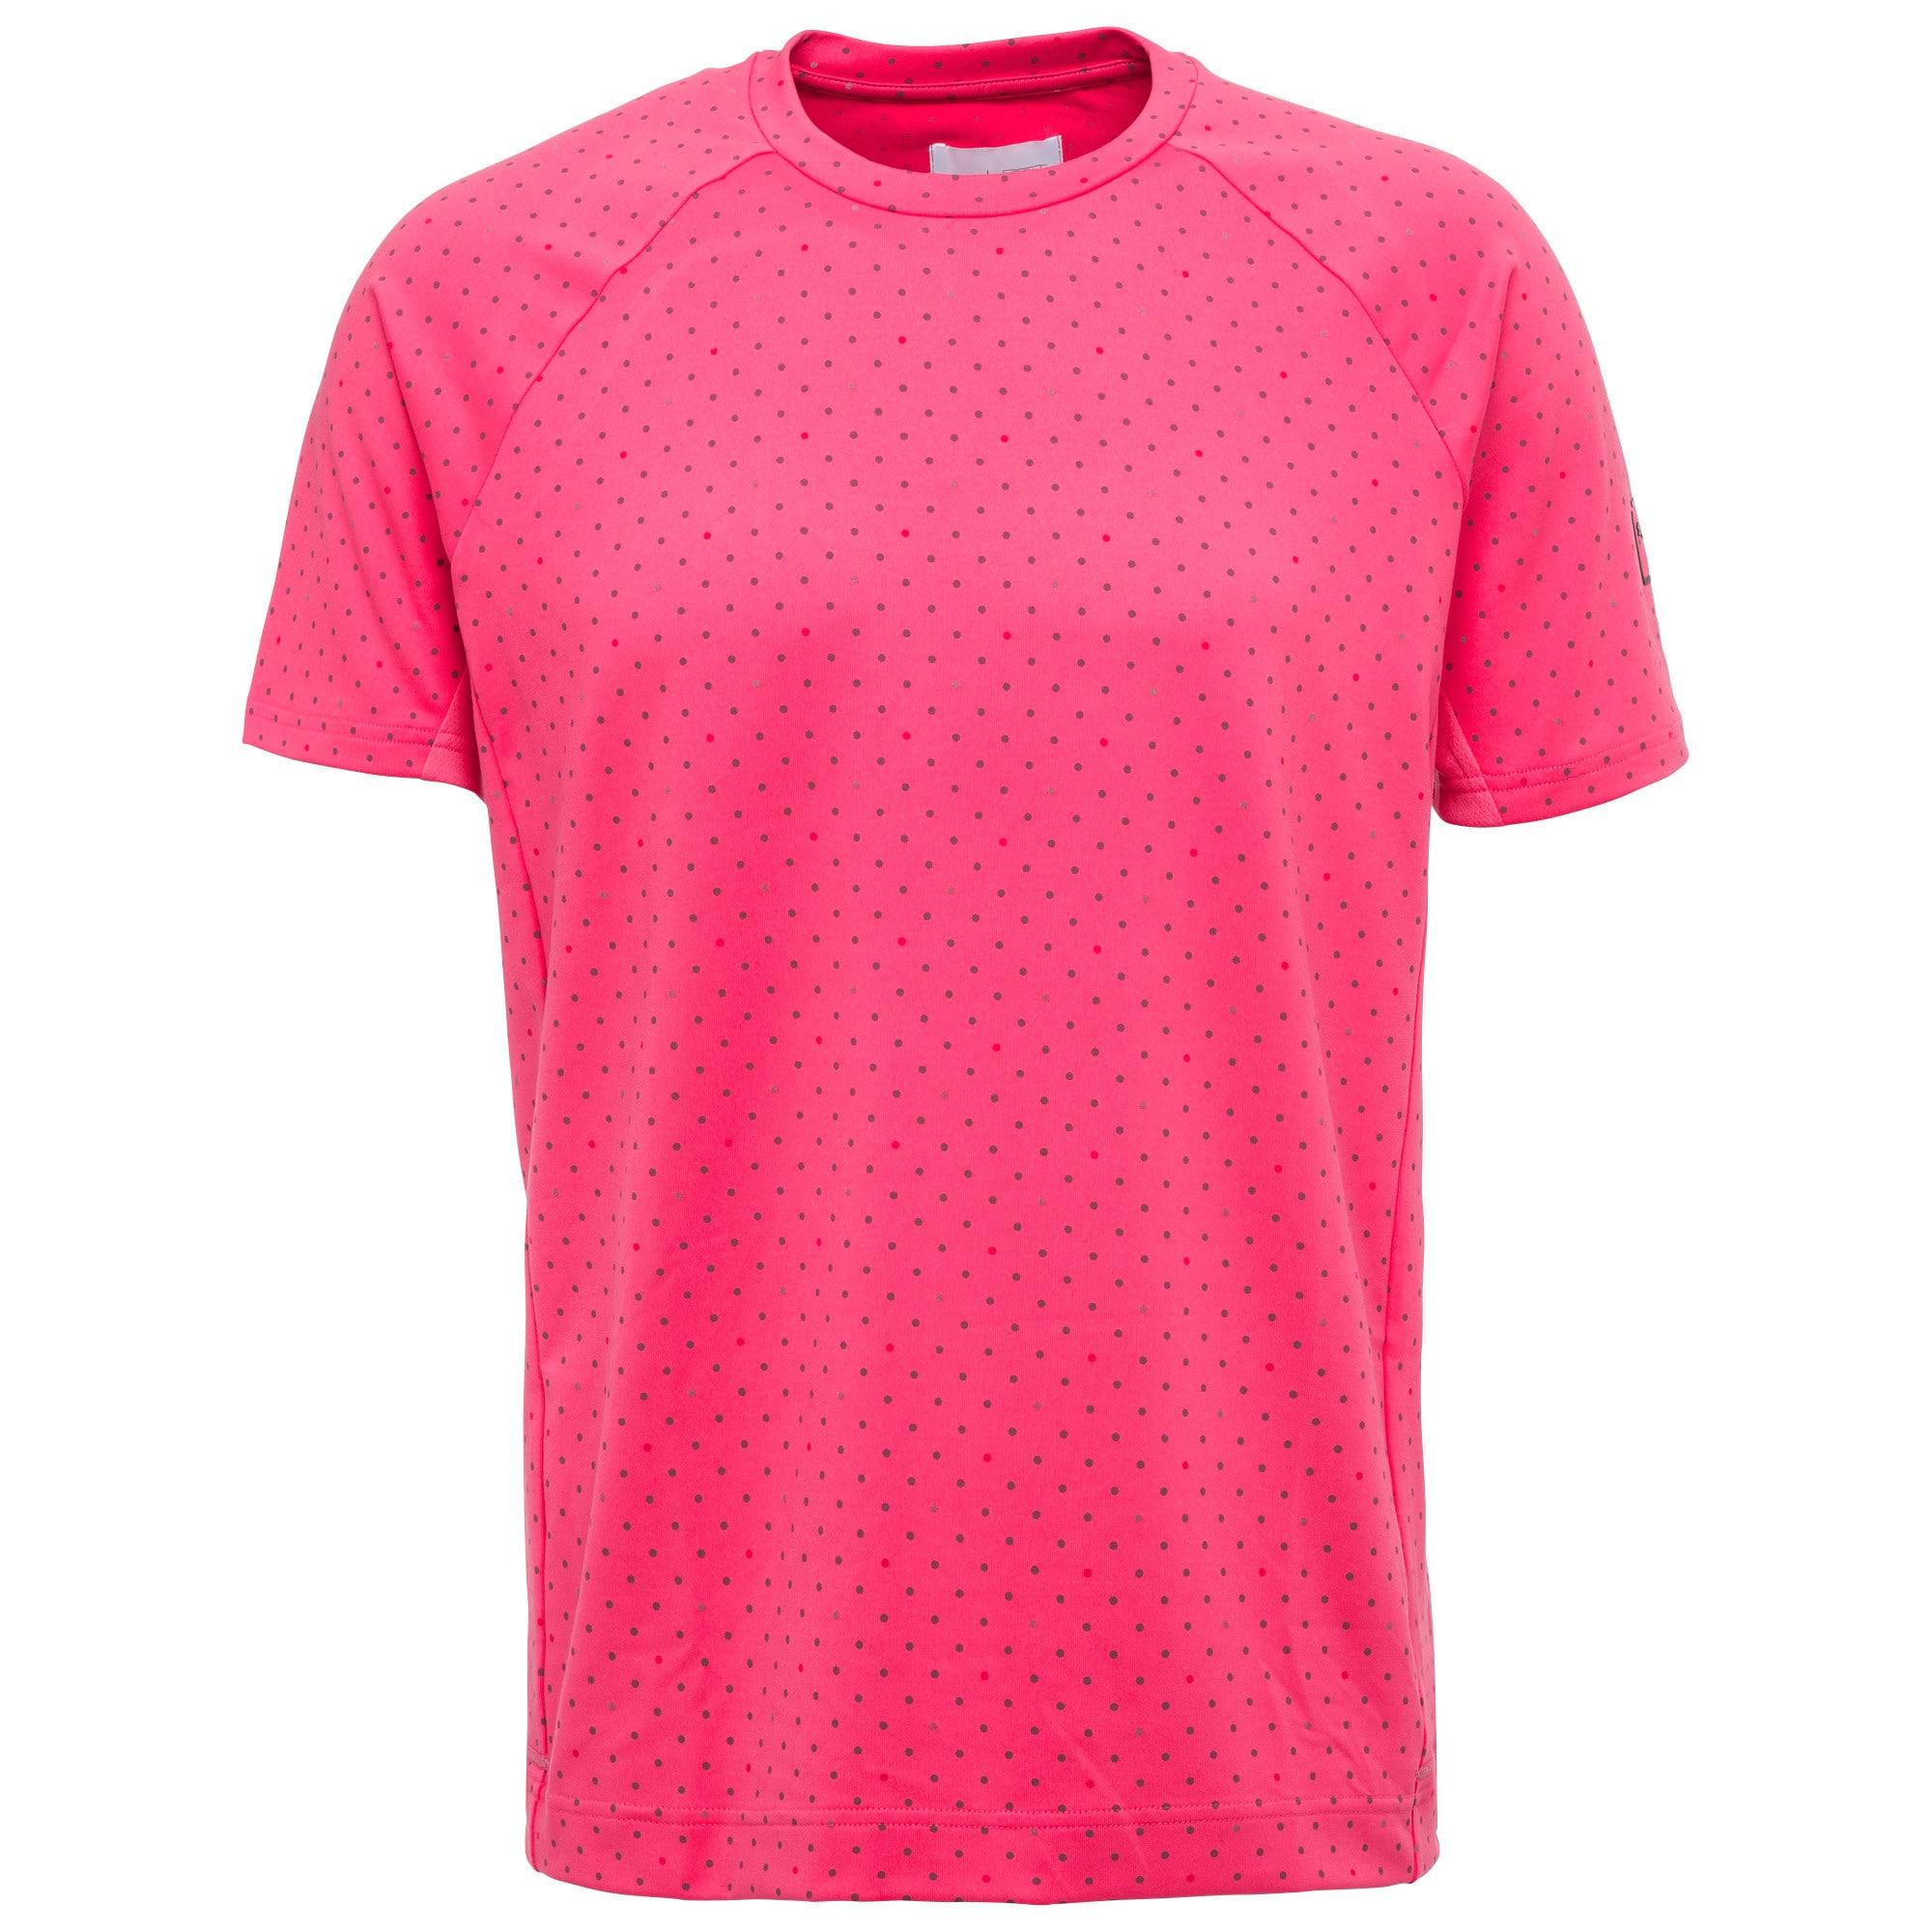 Thumbnail 3 of PUMA x STAPLE T-Shirt, Paradise Pink, medium-IND